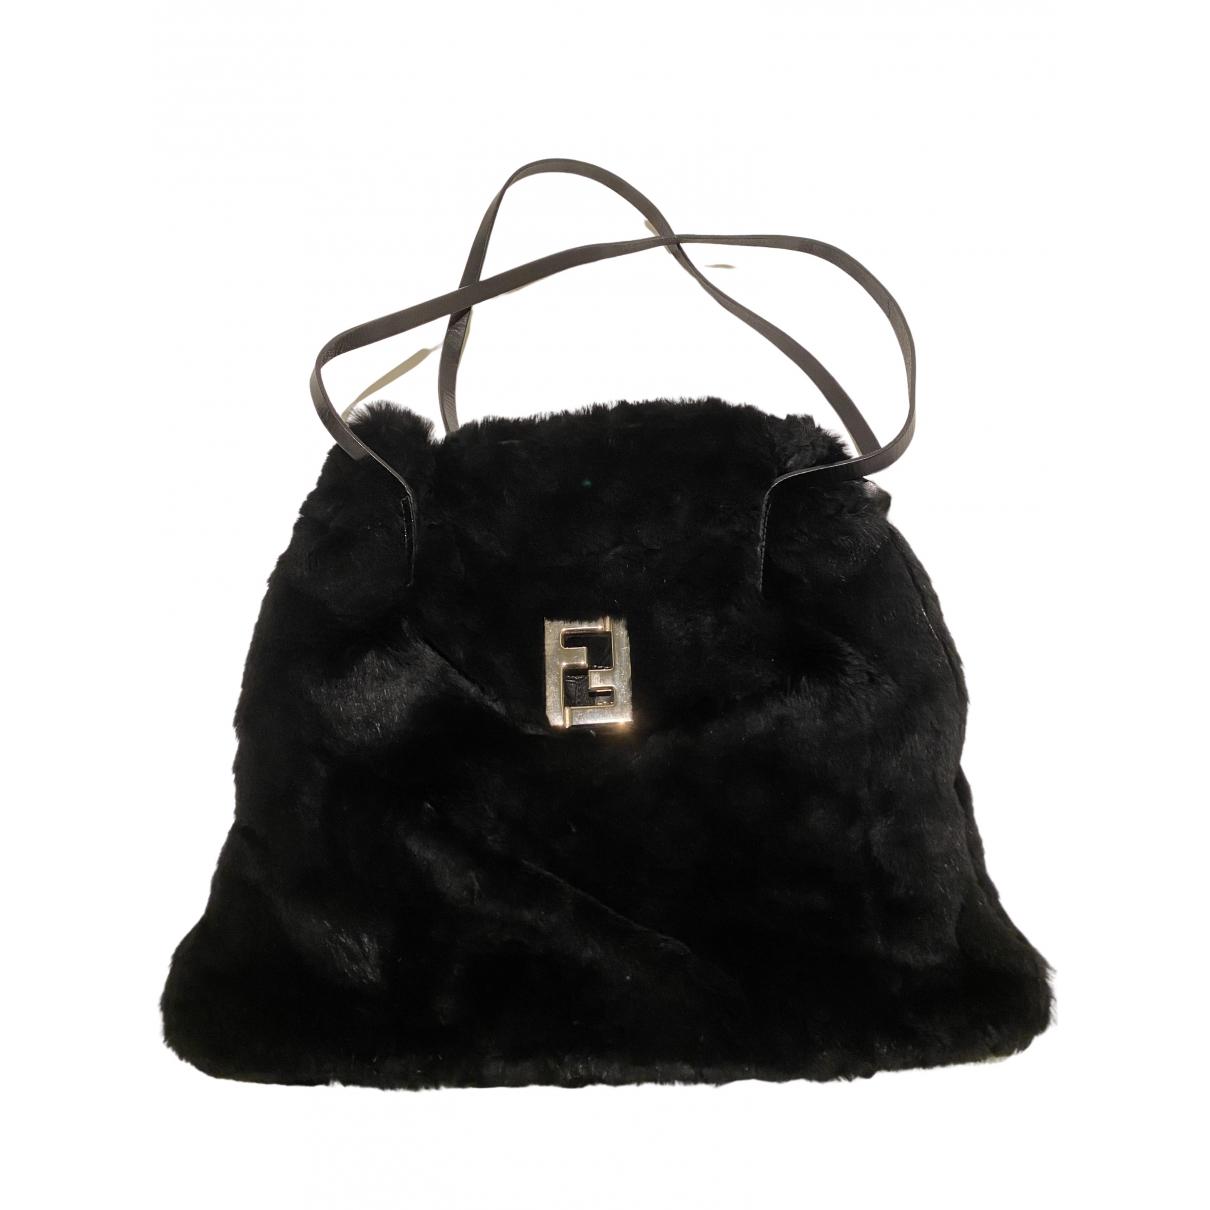 Fendi \N Handtasche in  Schwarz Synthetikpelz